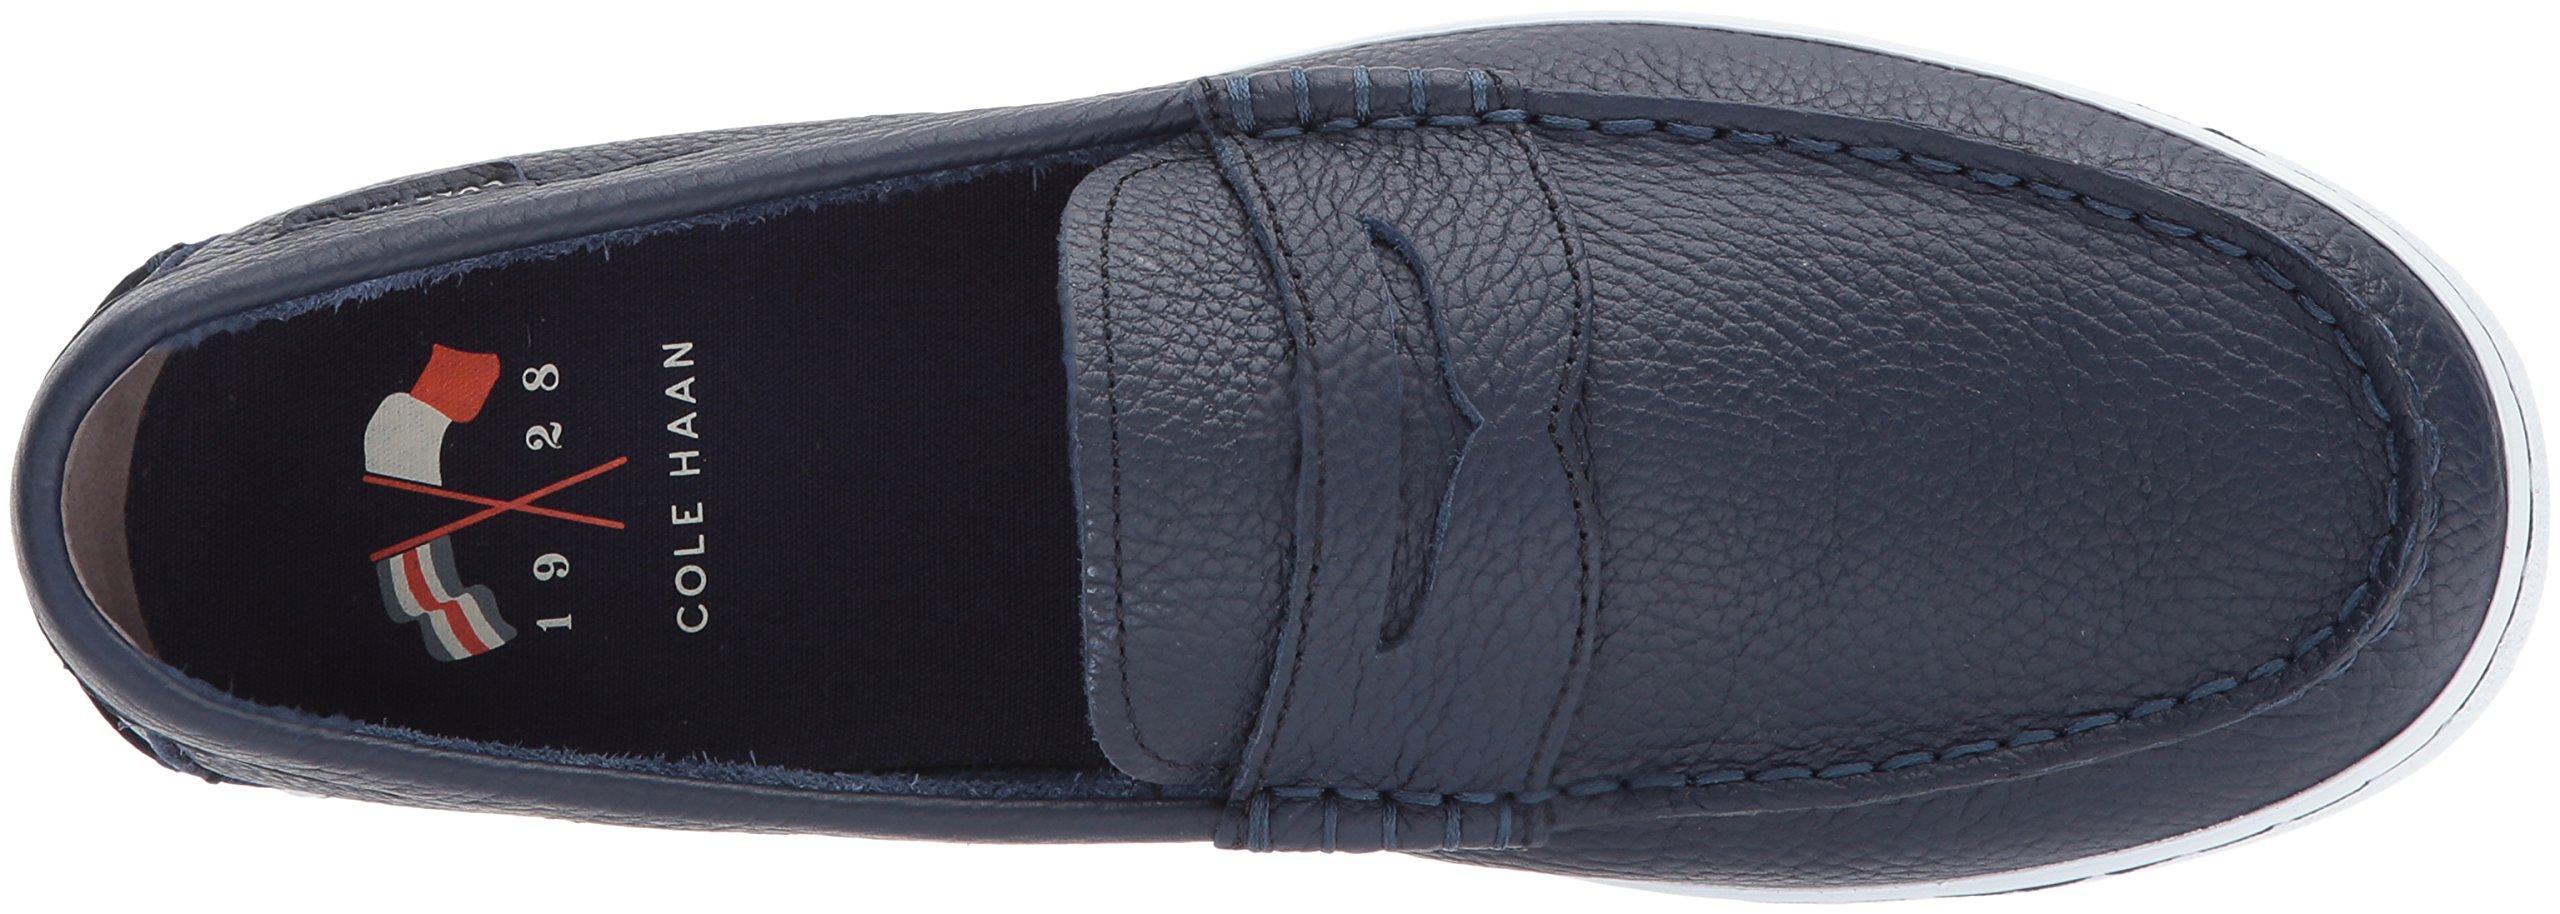 Cole Haan Men's Nantucket II Loafer, Peacoat Leather, 10.5 Medium US by Cole Haan (Image #8)